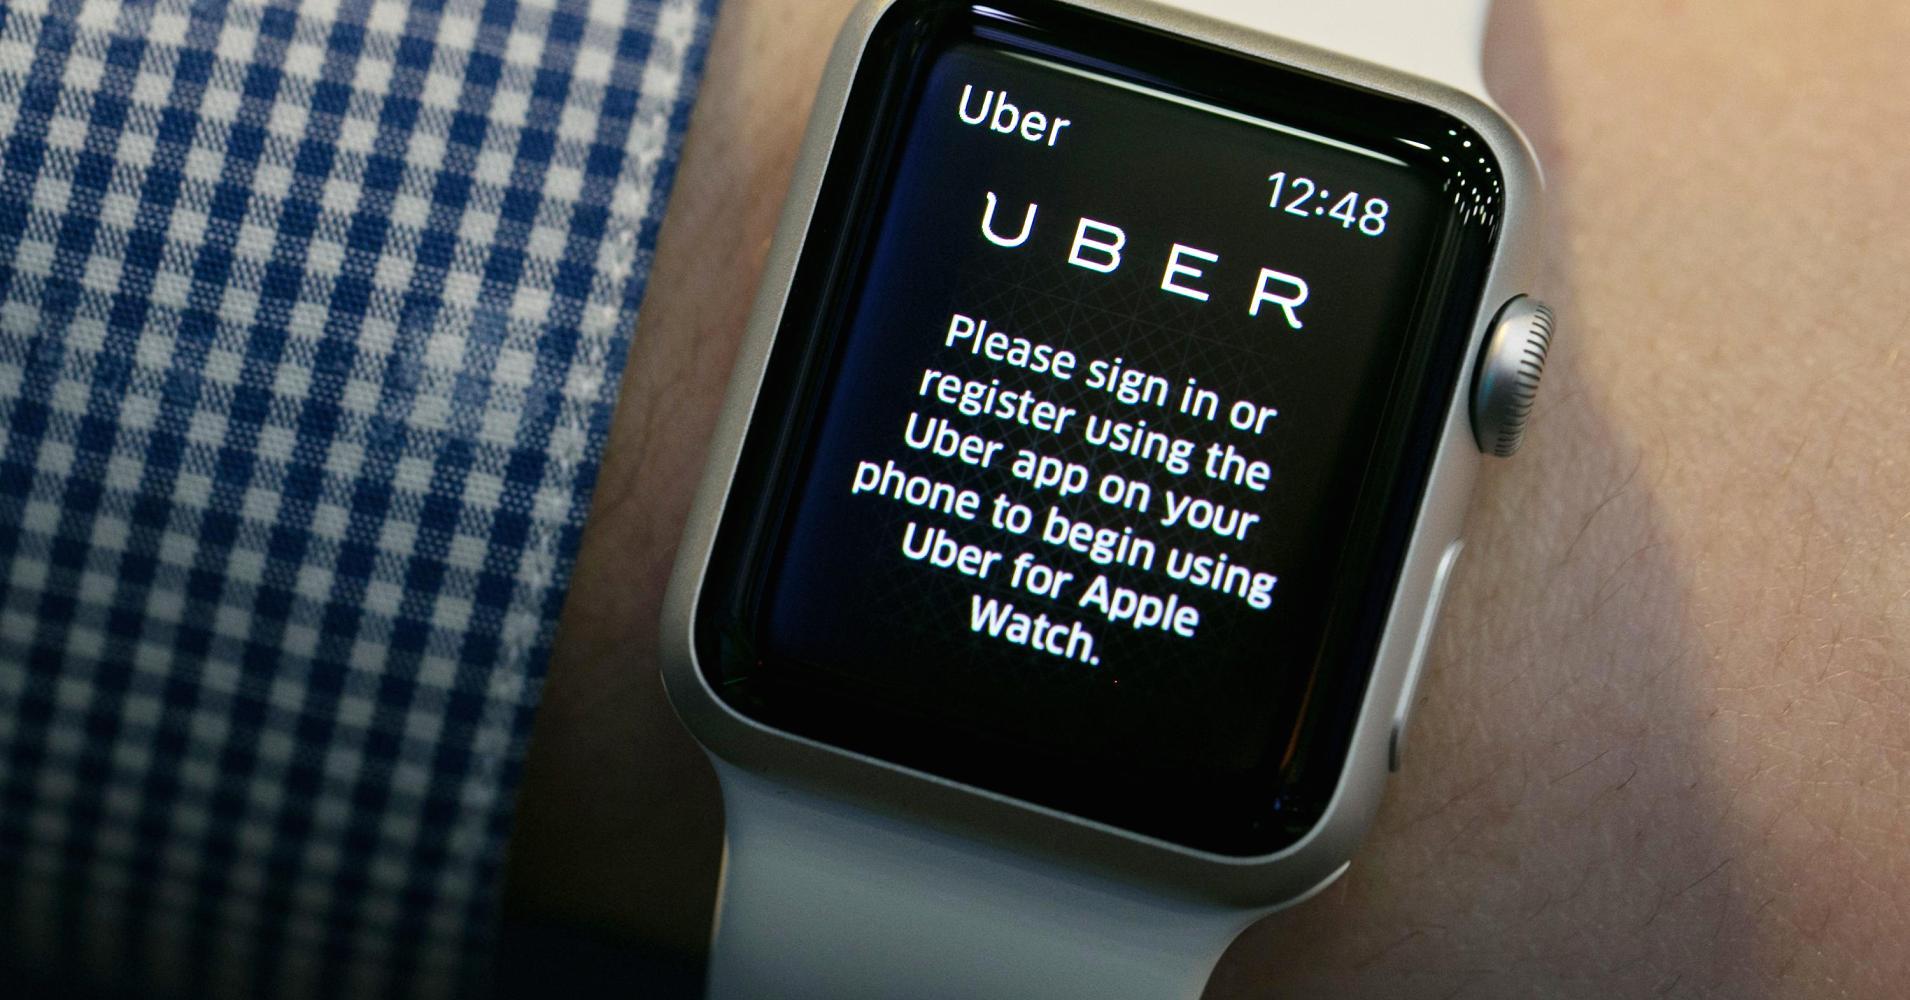 102618869-apple-watch-uber.1910x1000